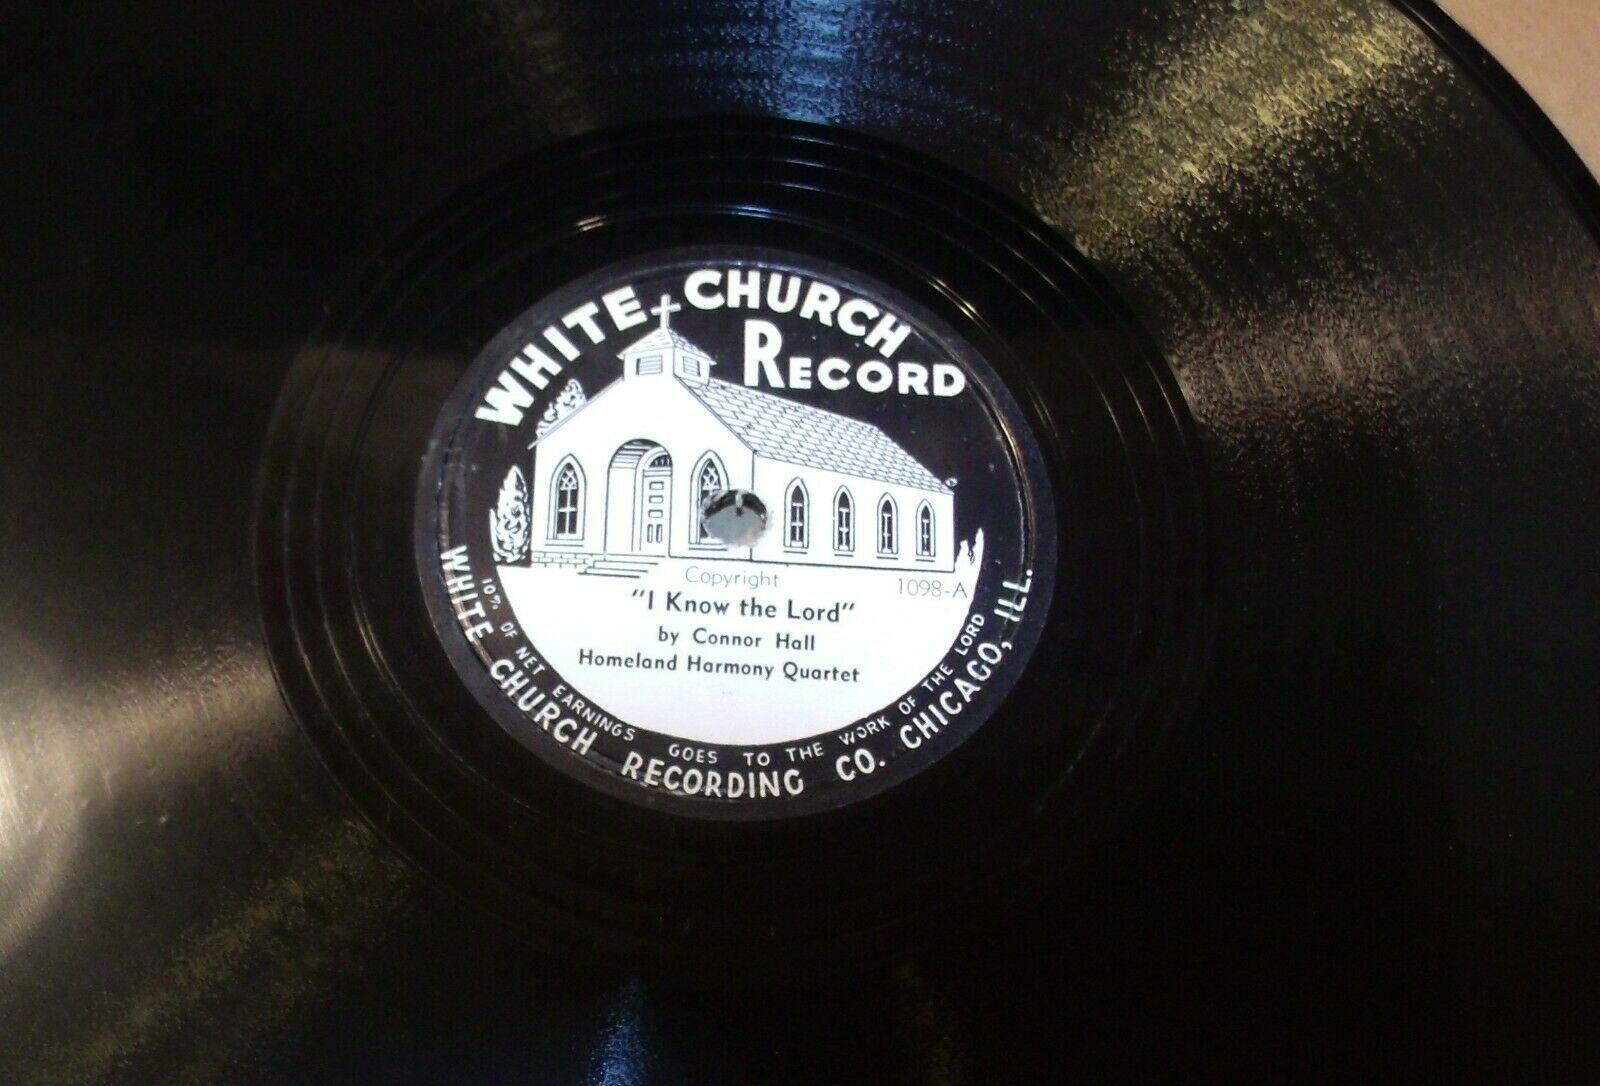 White ChurchRecord # 1098 AA-191720G Vintage Collectible